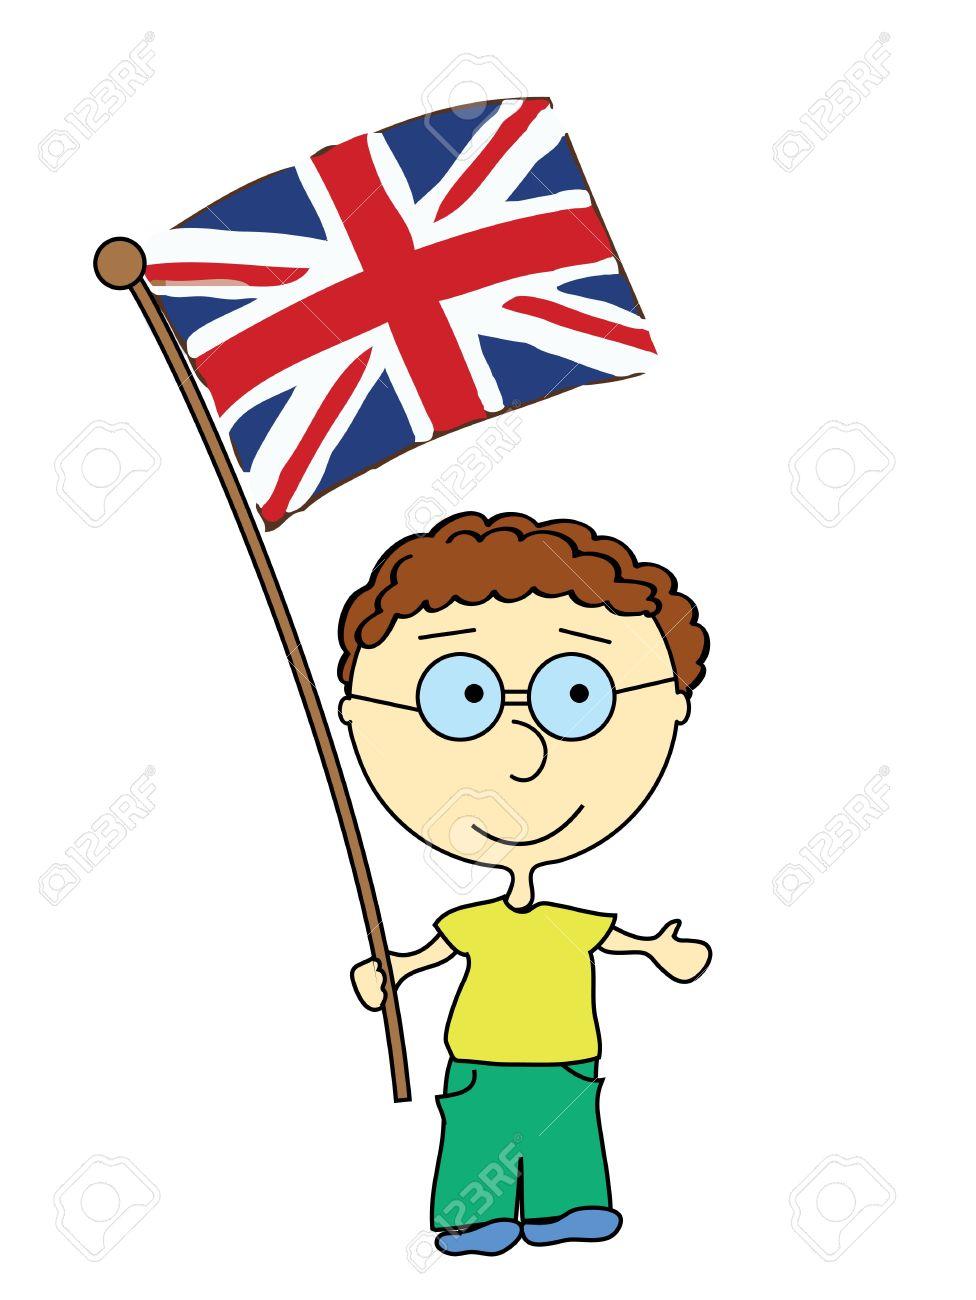 La Bandera De Inglaterra. Beautiful Inglesapng With La Bandera De ...